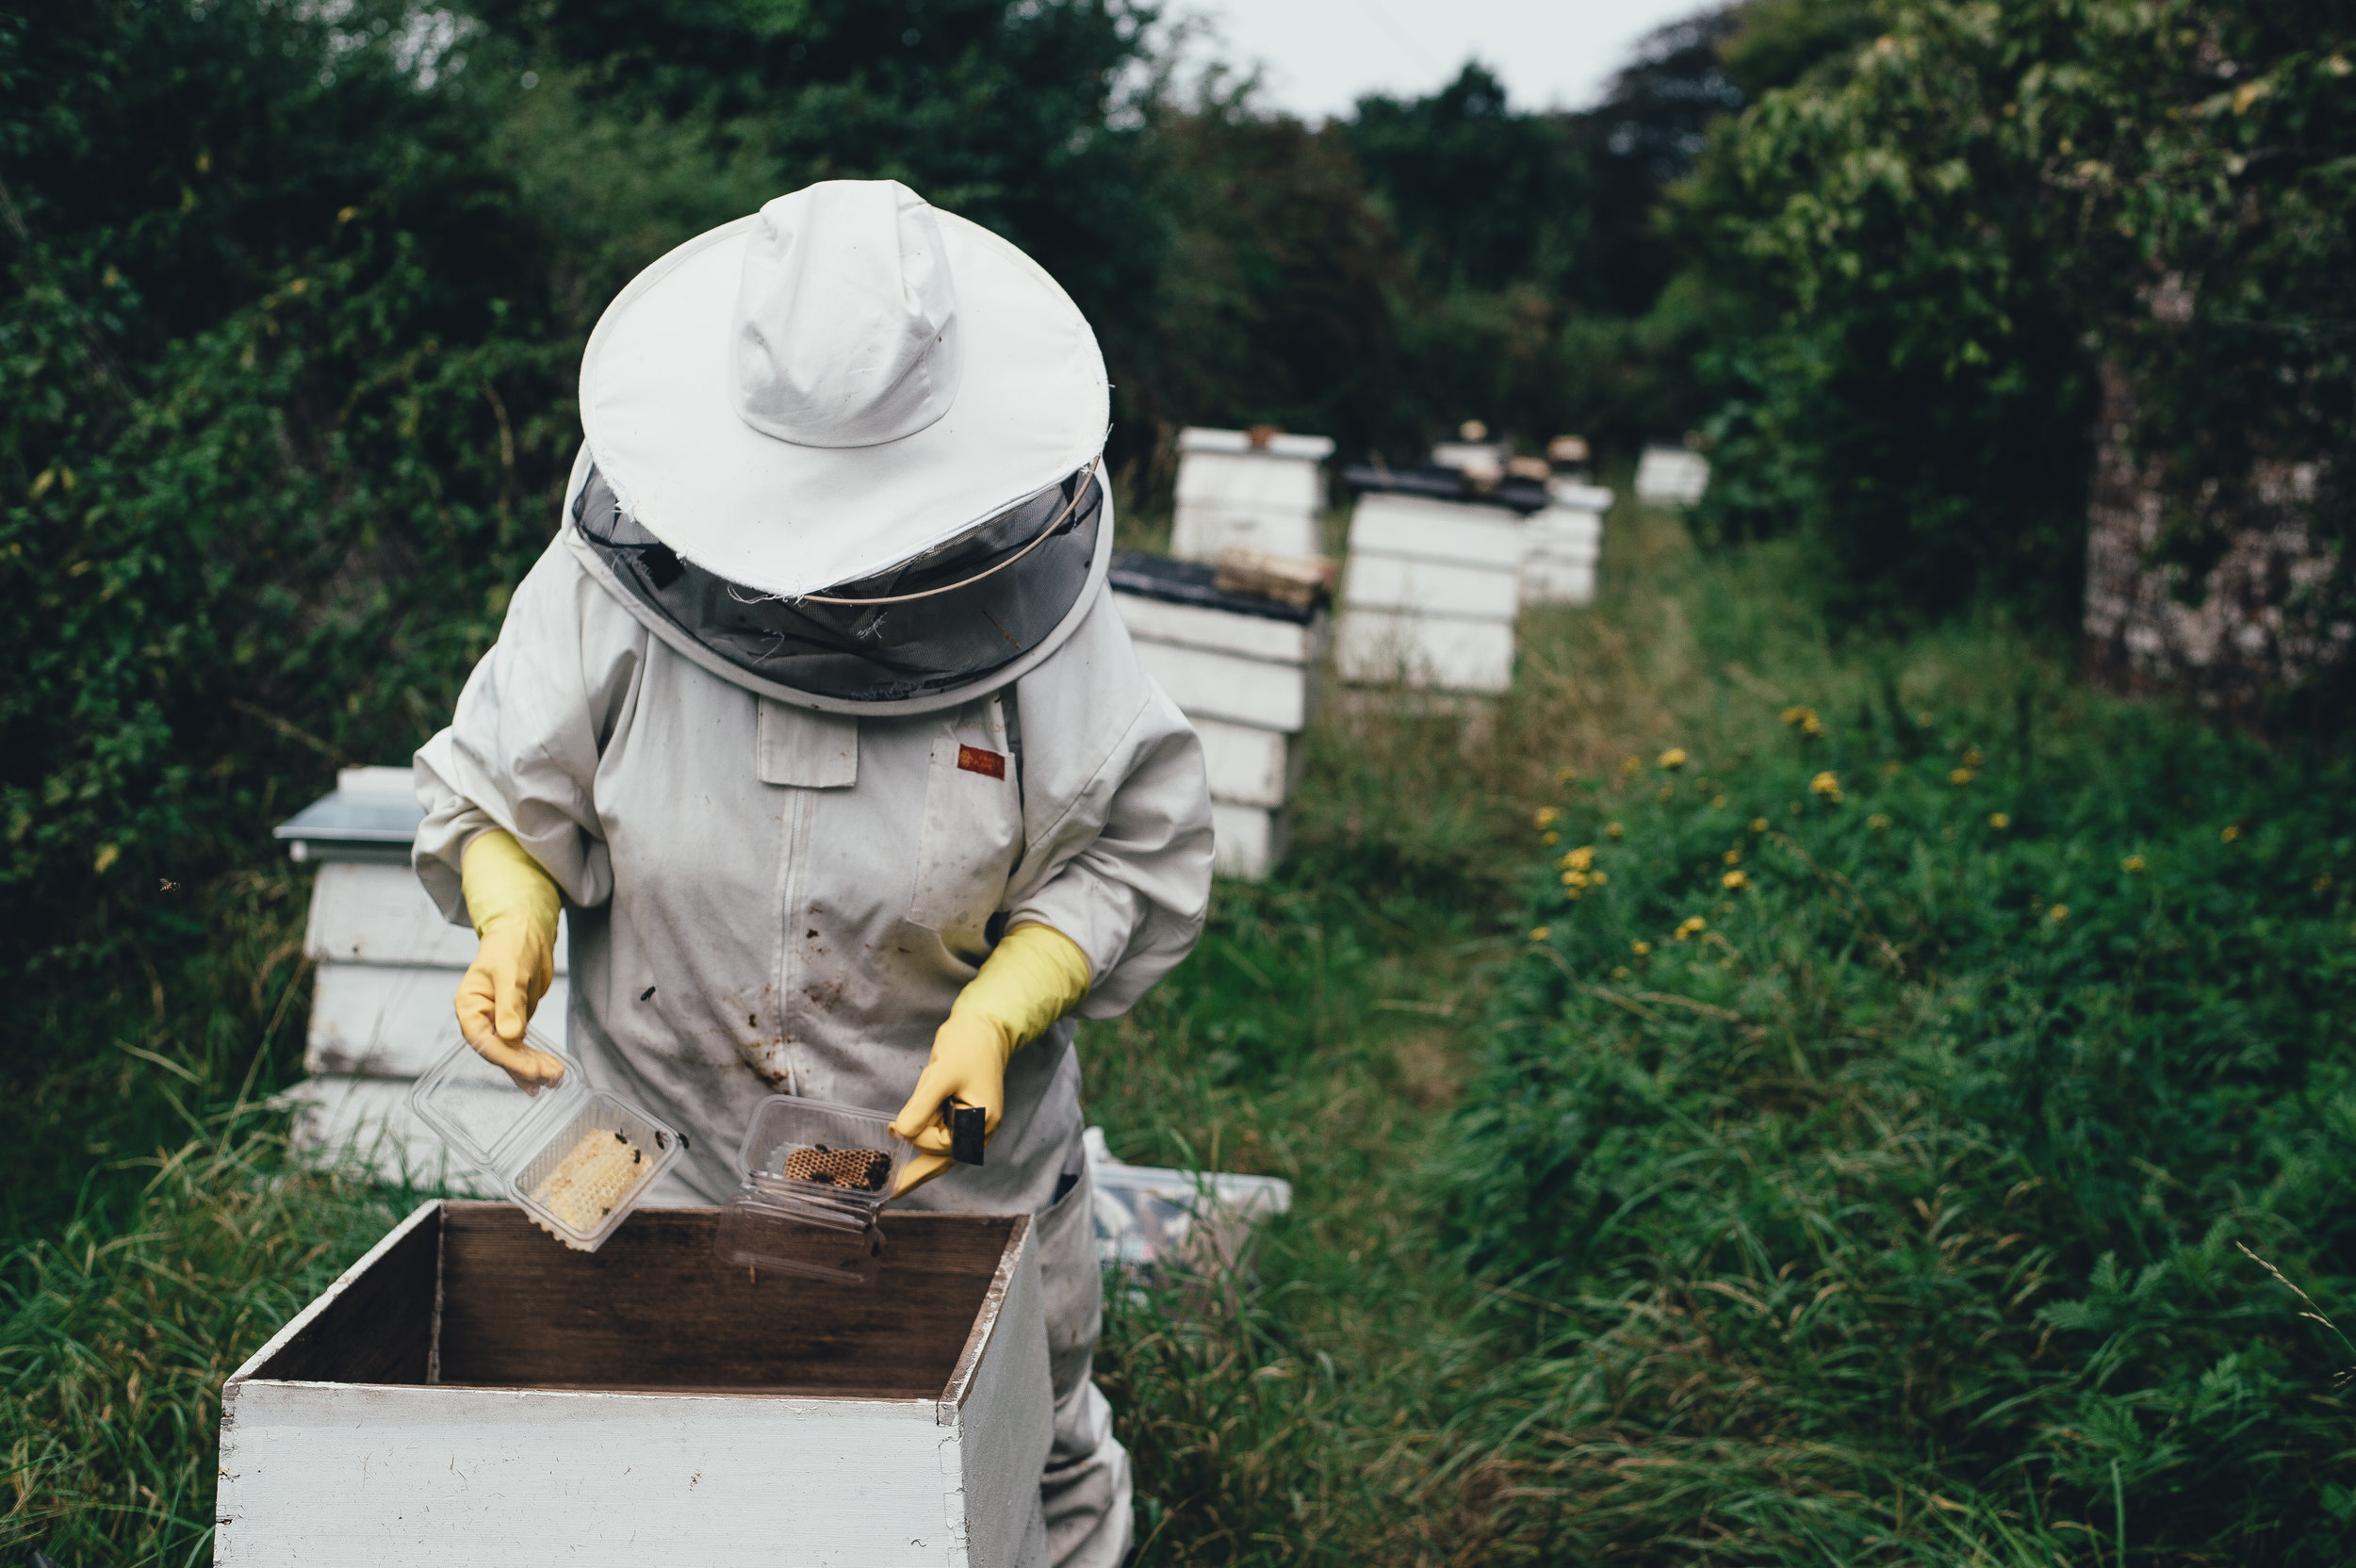 Extracts of Polypore Mushroom Mycelia Reduce Viruses in Honey Bees   Paul E. Stamets  et.al